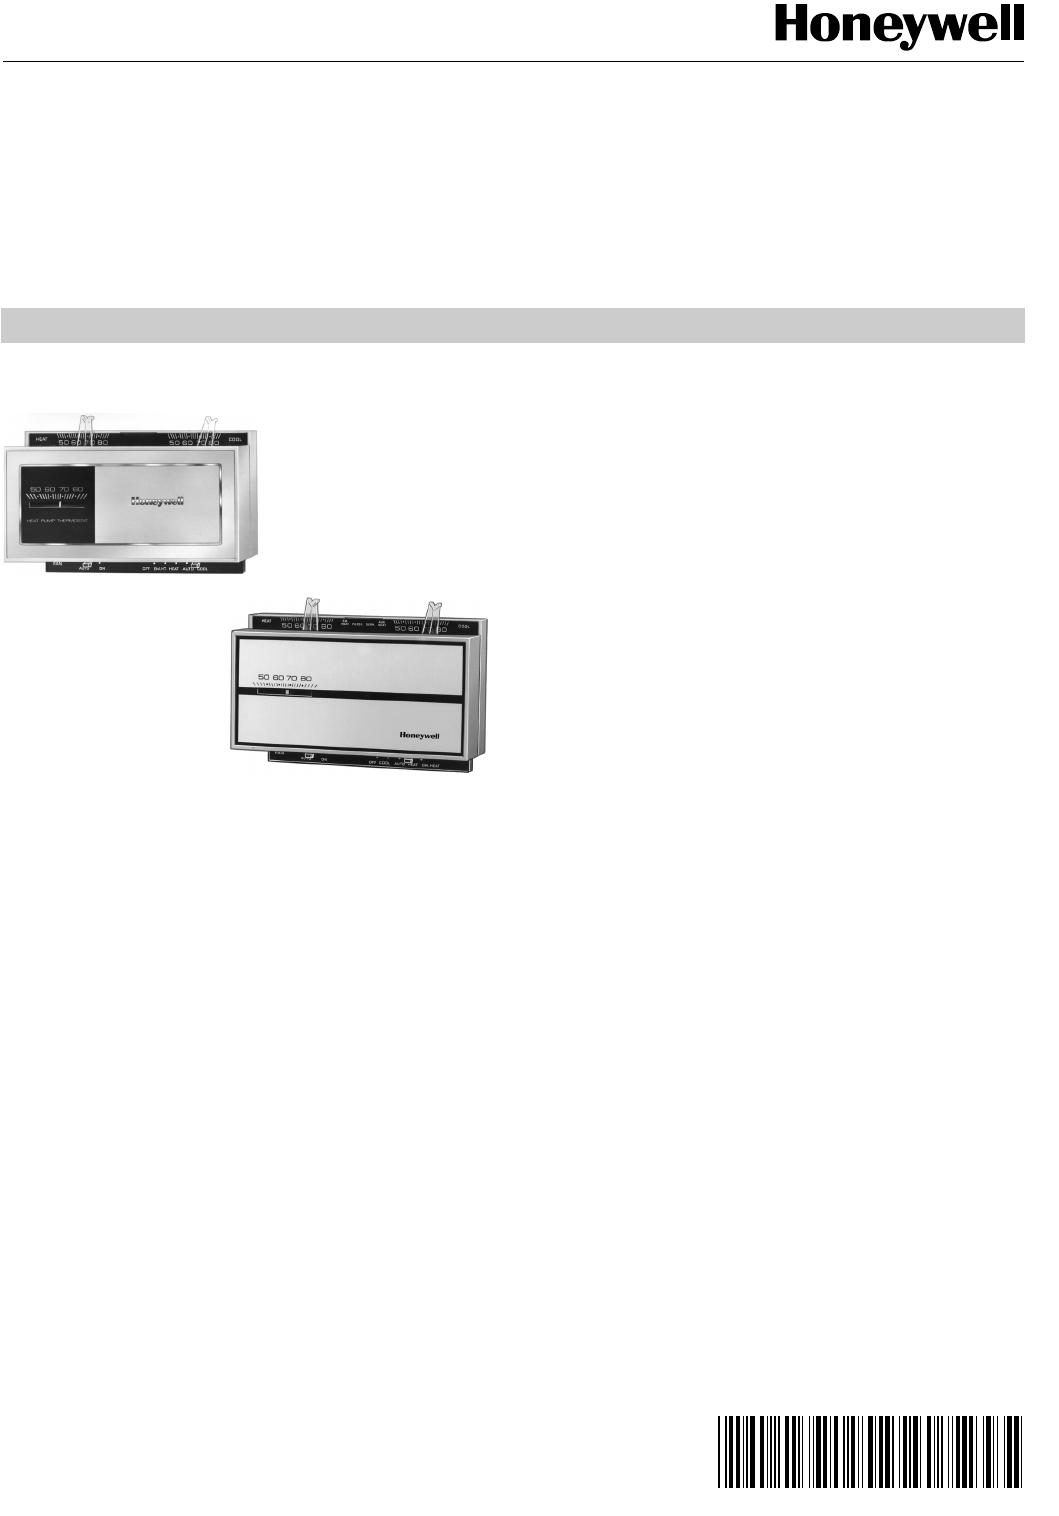 york thermostat t874r1046 wiring diagram